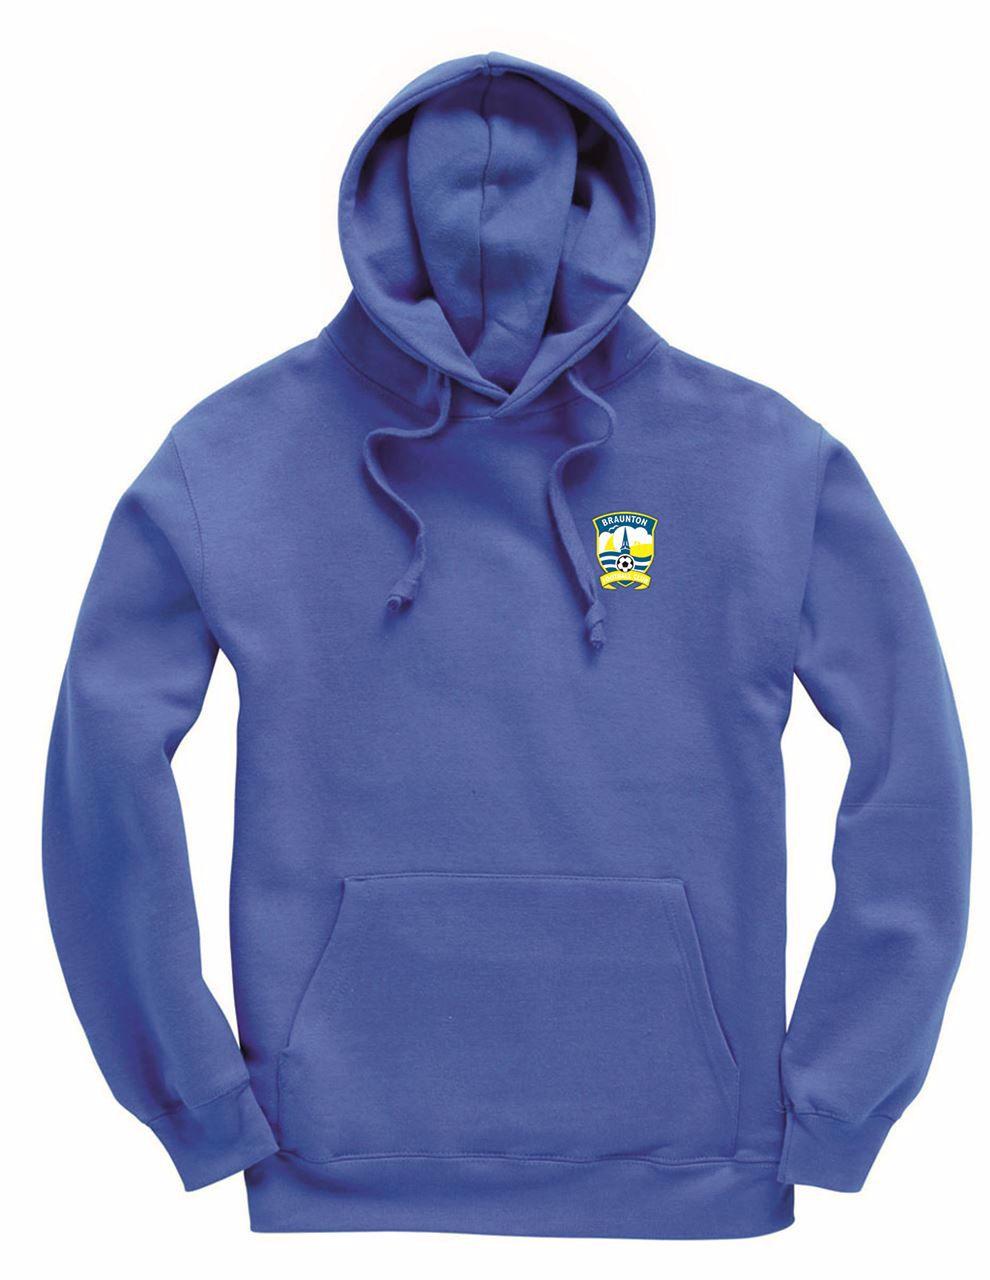 Braunton Abilities FC Hoody - JUNIOR SIZES